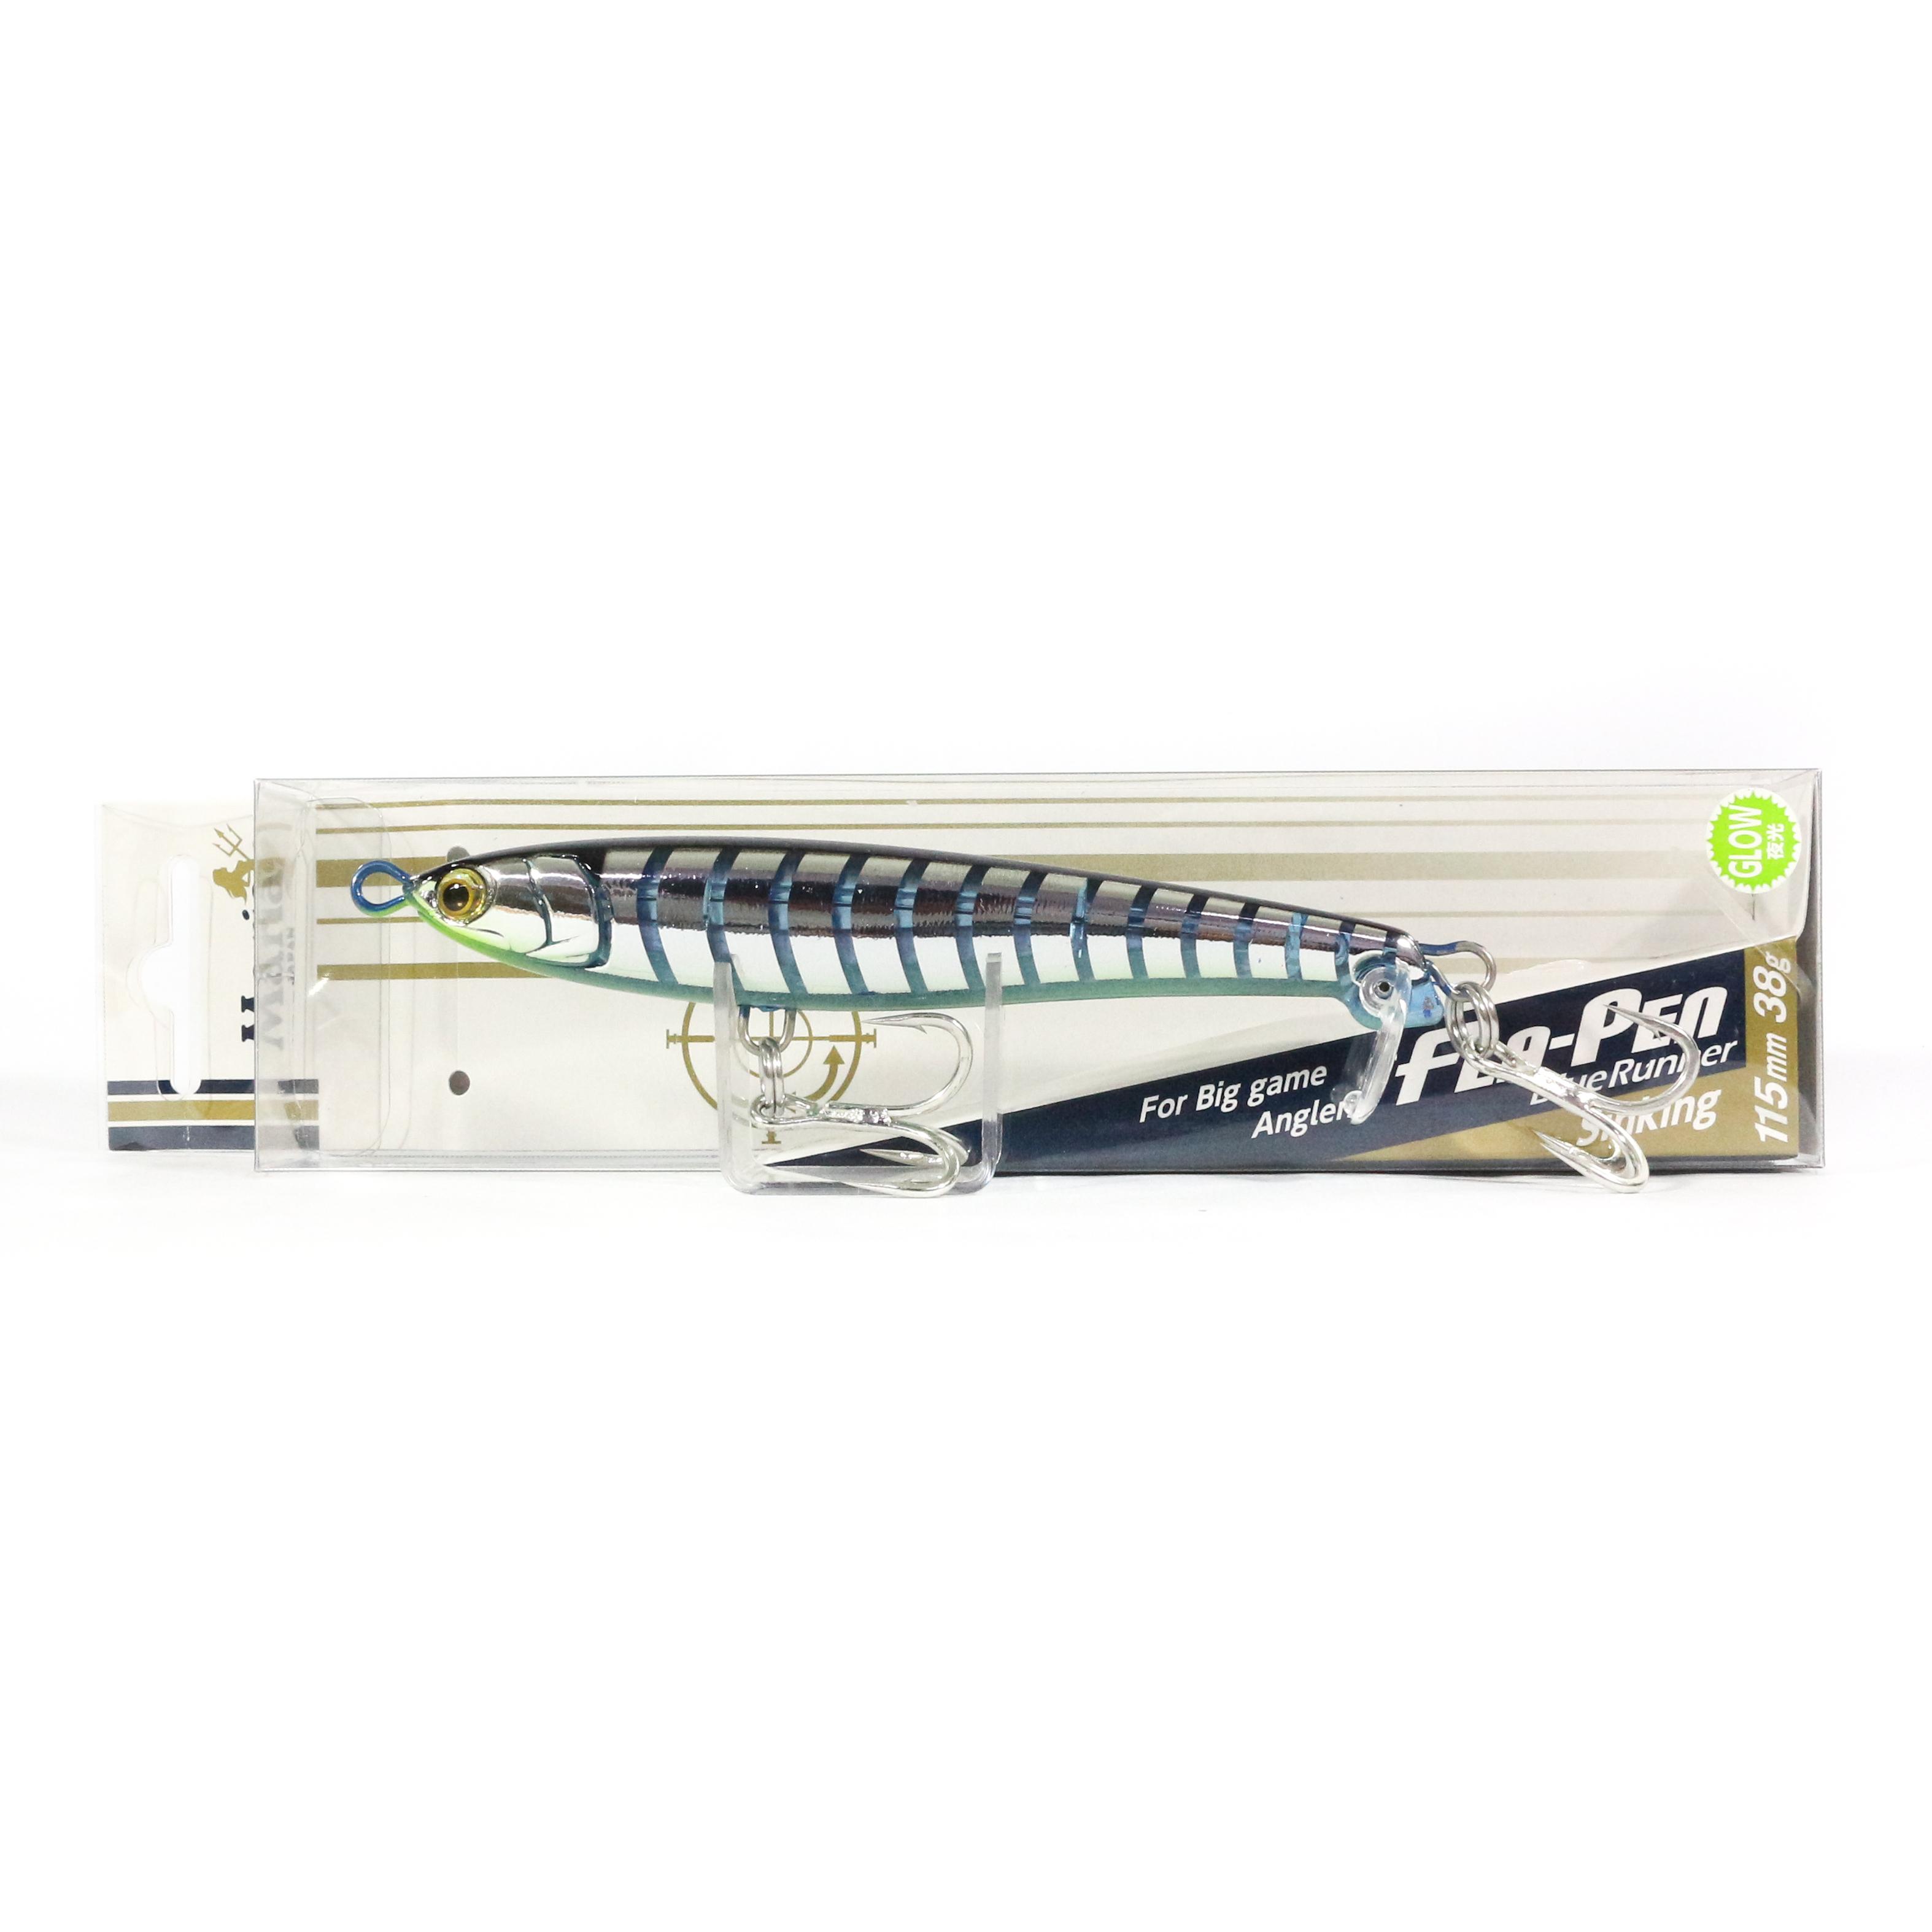 Maria Fla Pen S115 Fluttering Pencil Sinking Lure B07D (2100)